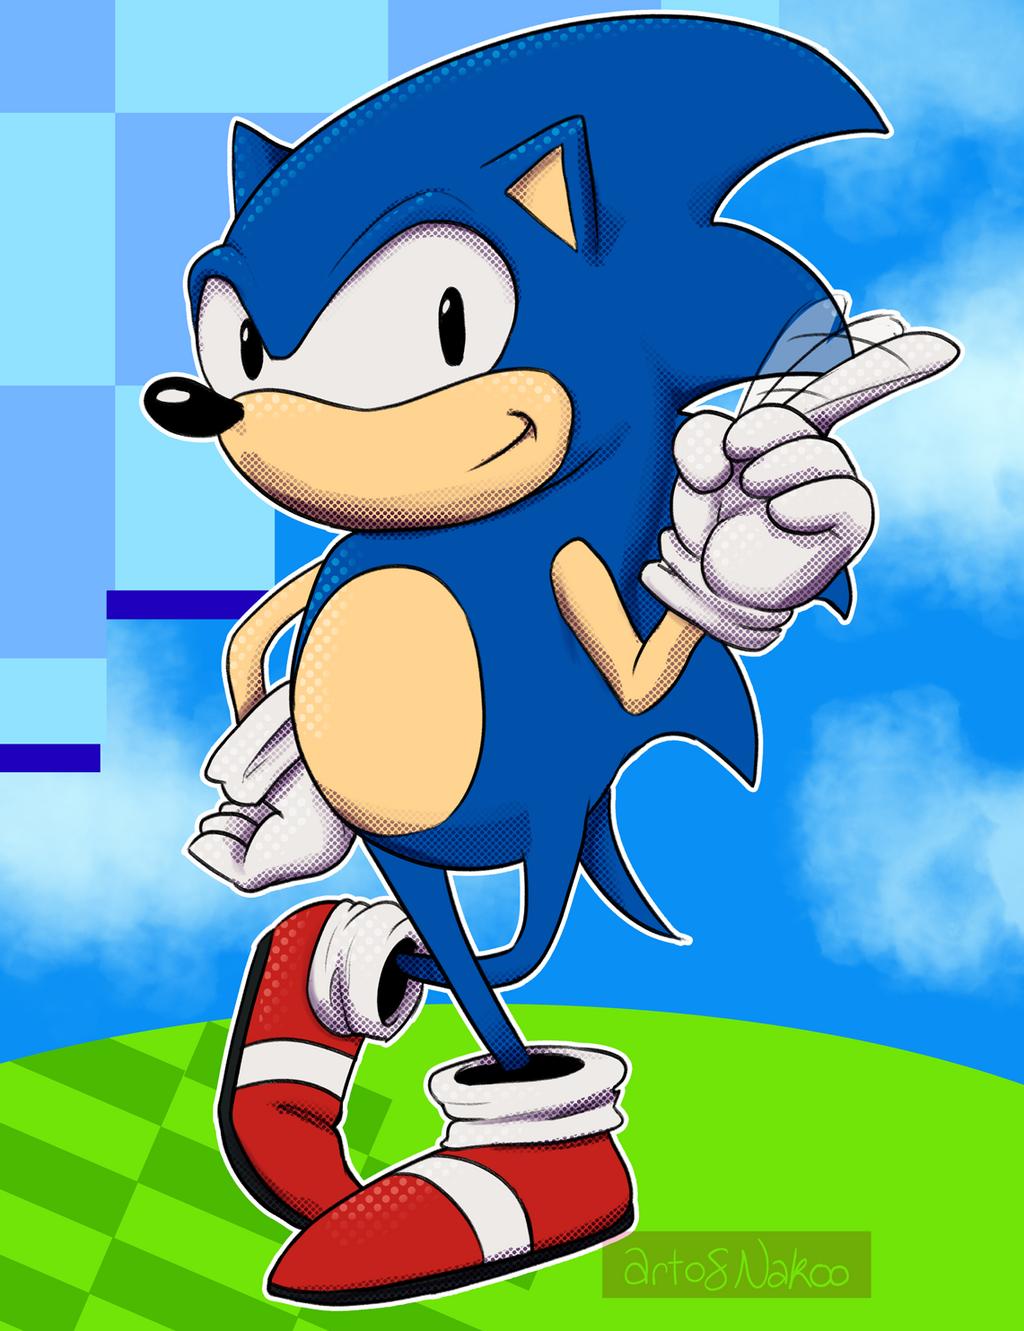 Clasic Sonic